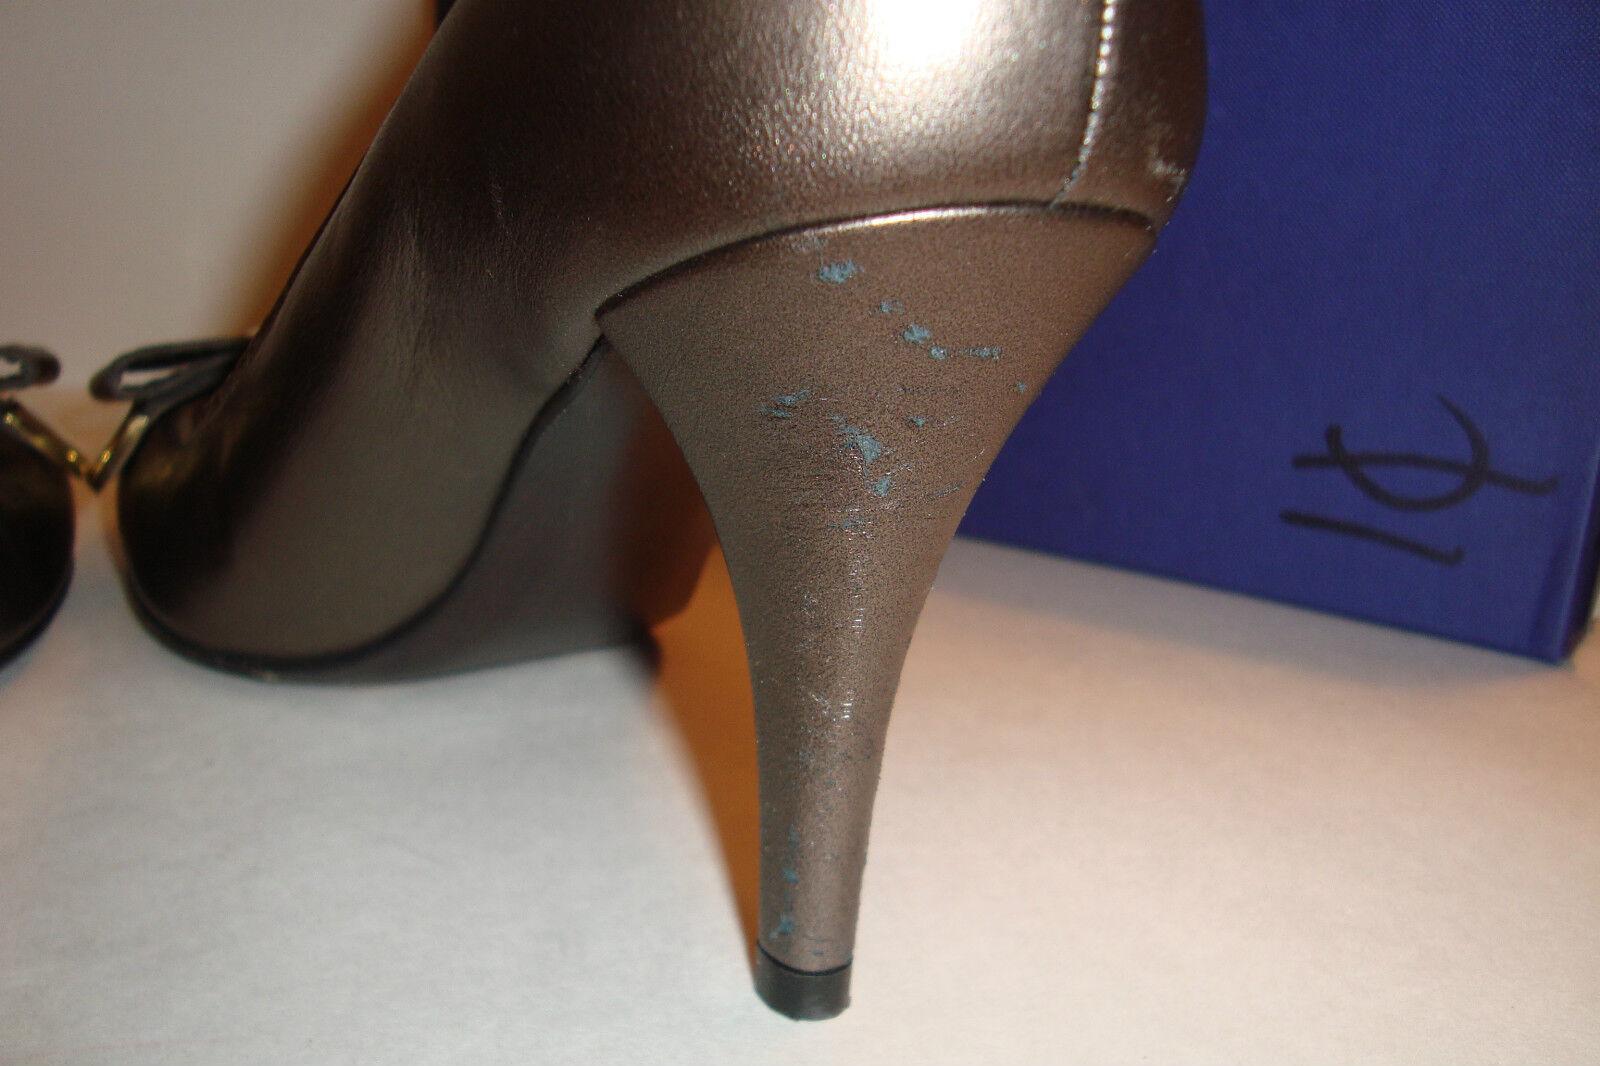 Stuart Mordore Weitzman Damenschuhe Bwana Sepia Mordore Stuart Bronze Heels Schuhes 10.5 Med Display 9cc2f2